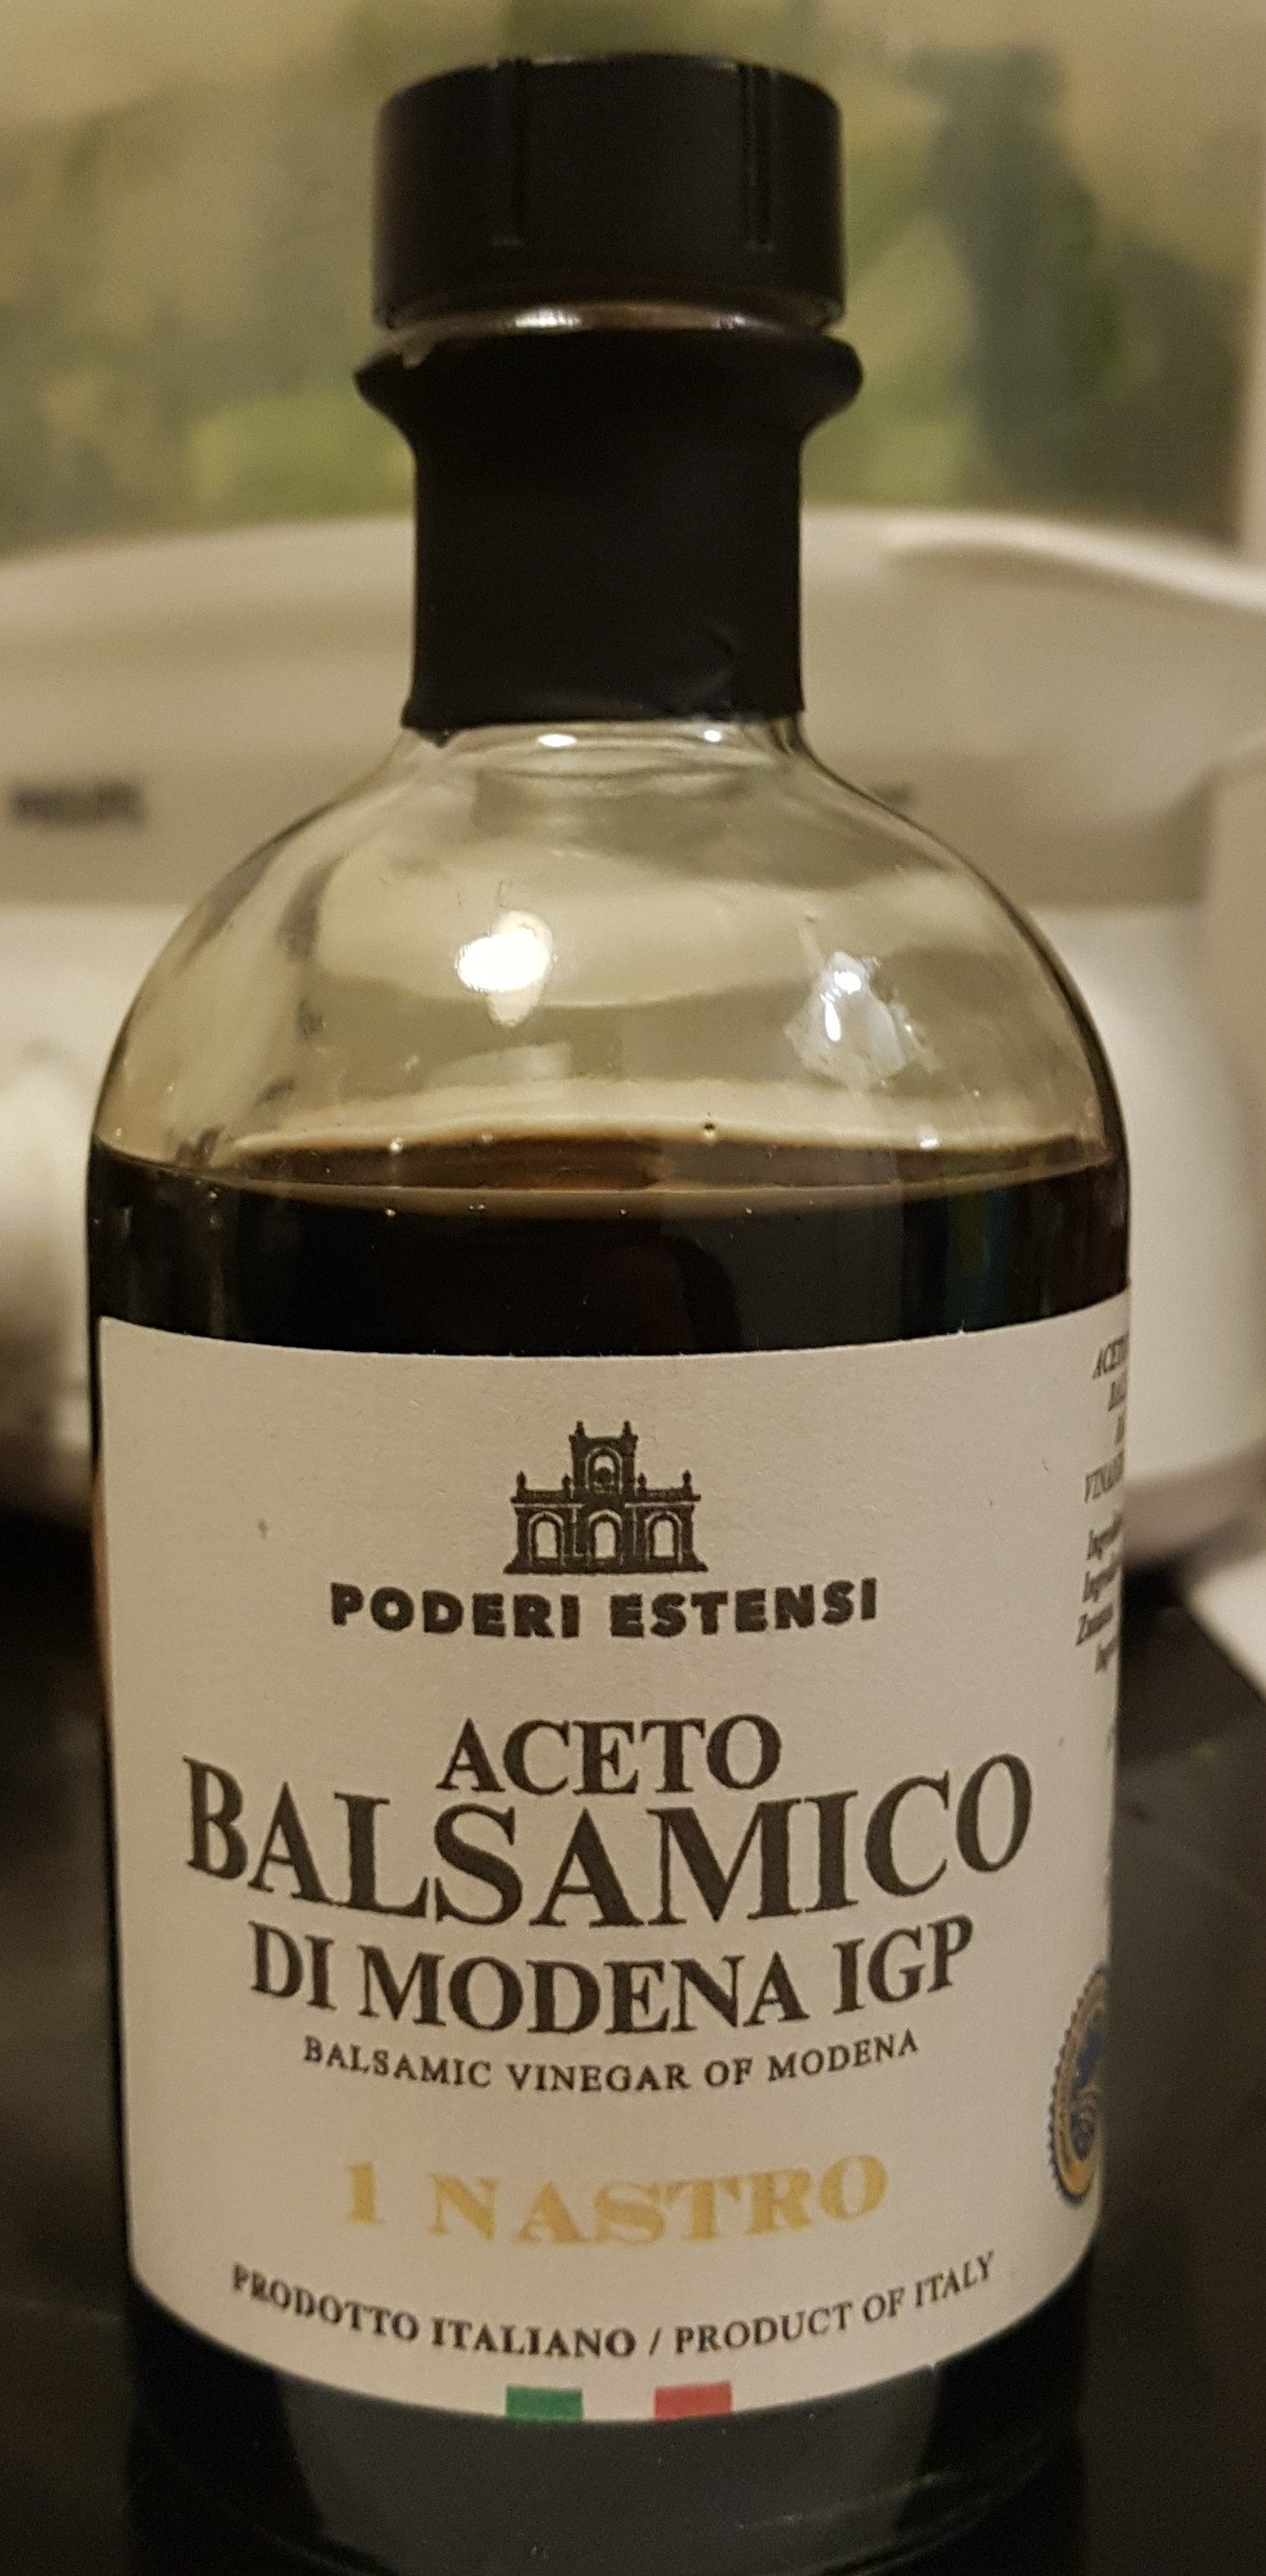 Vinaigre Balsamique De Modene Igp Goccia Nera 25CL - Product